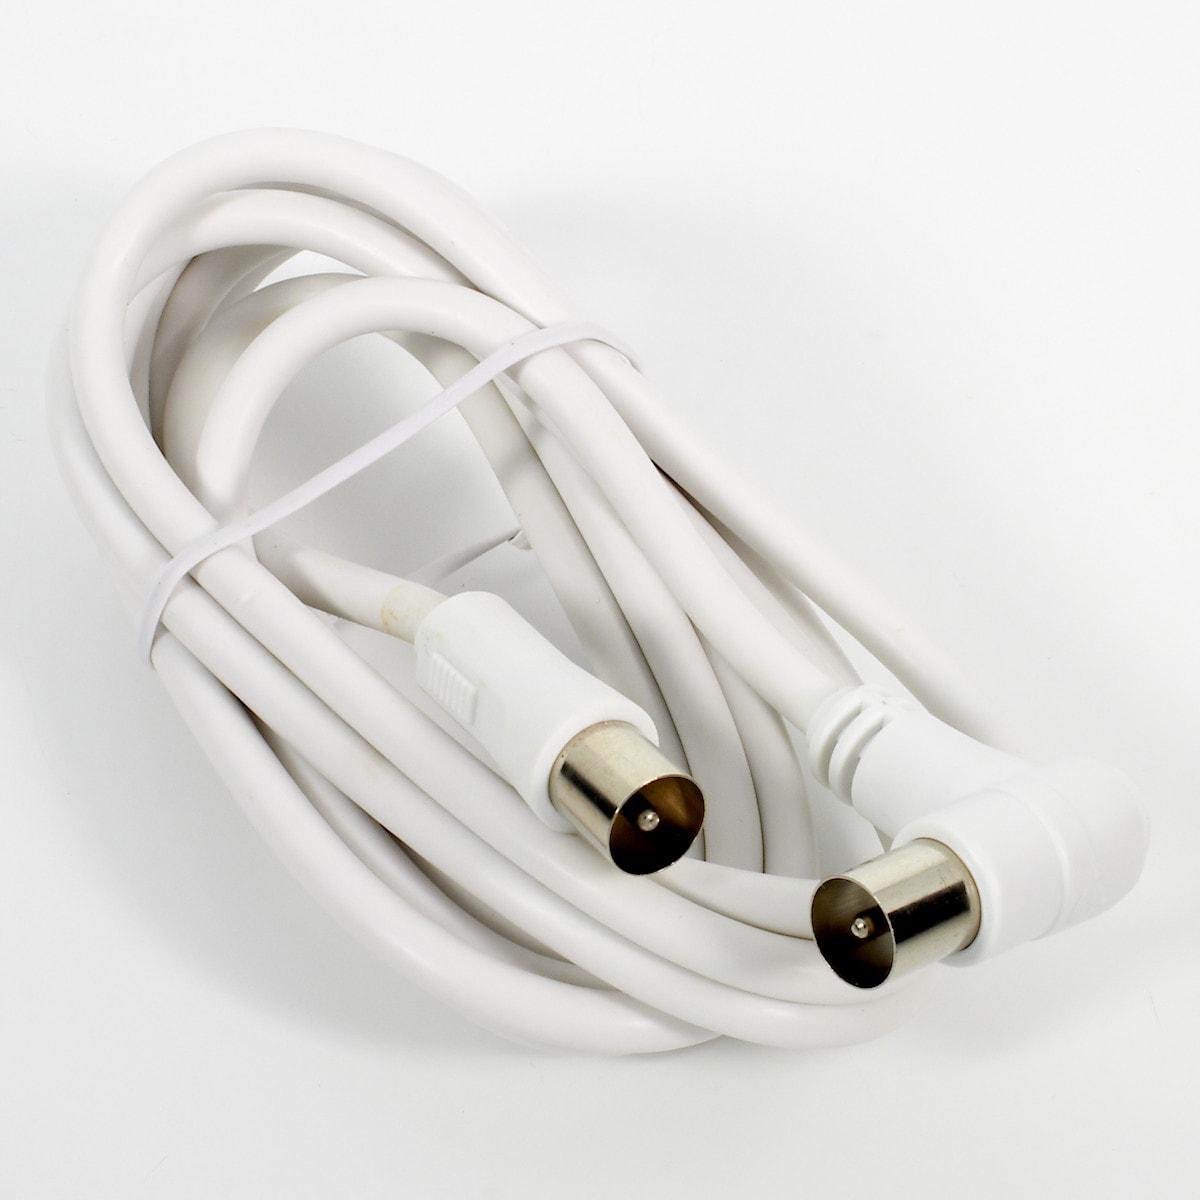 Antennkabel